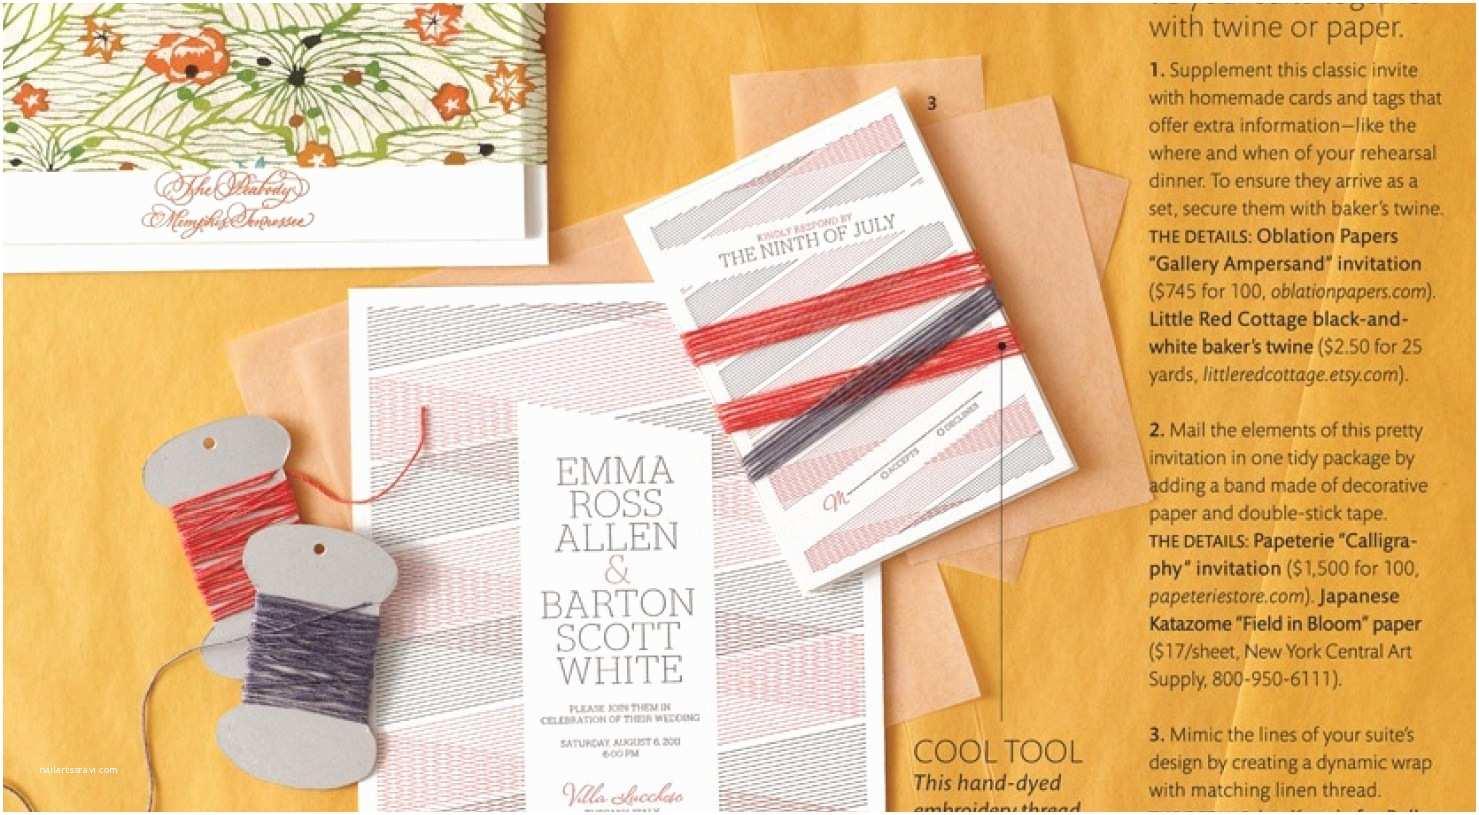 Wedding Invitation Package Deals Luxury Wedding Invitations Packages Painterly Floral Weddi